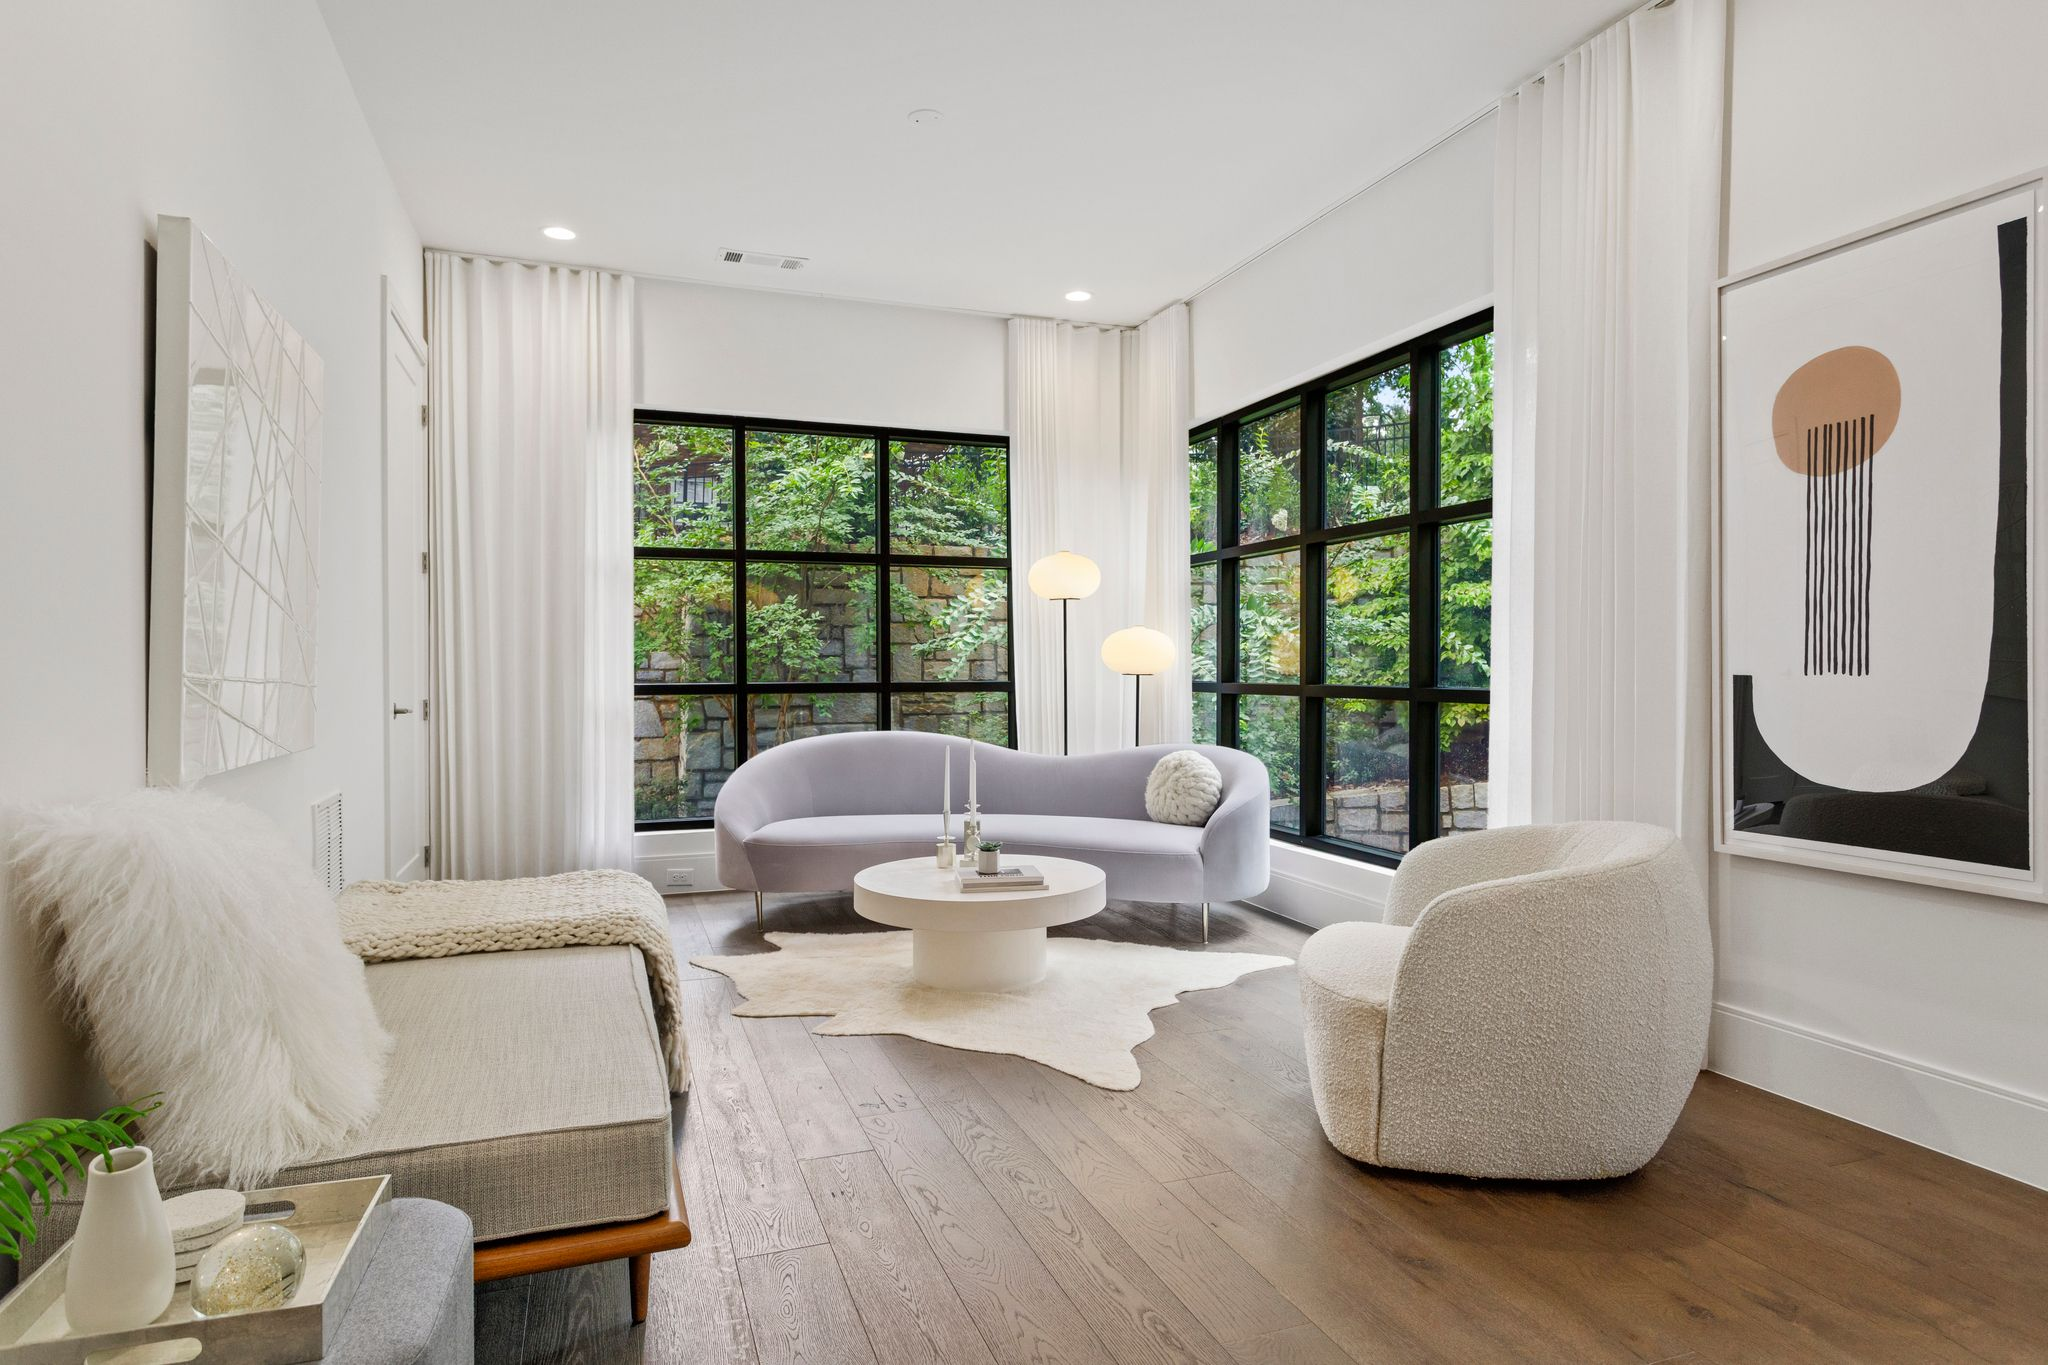 Living Area featured in the Condo By Minerva Homes in Atlanta, GA